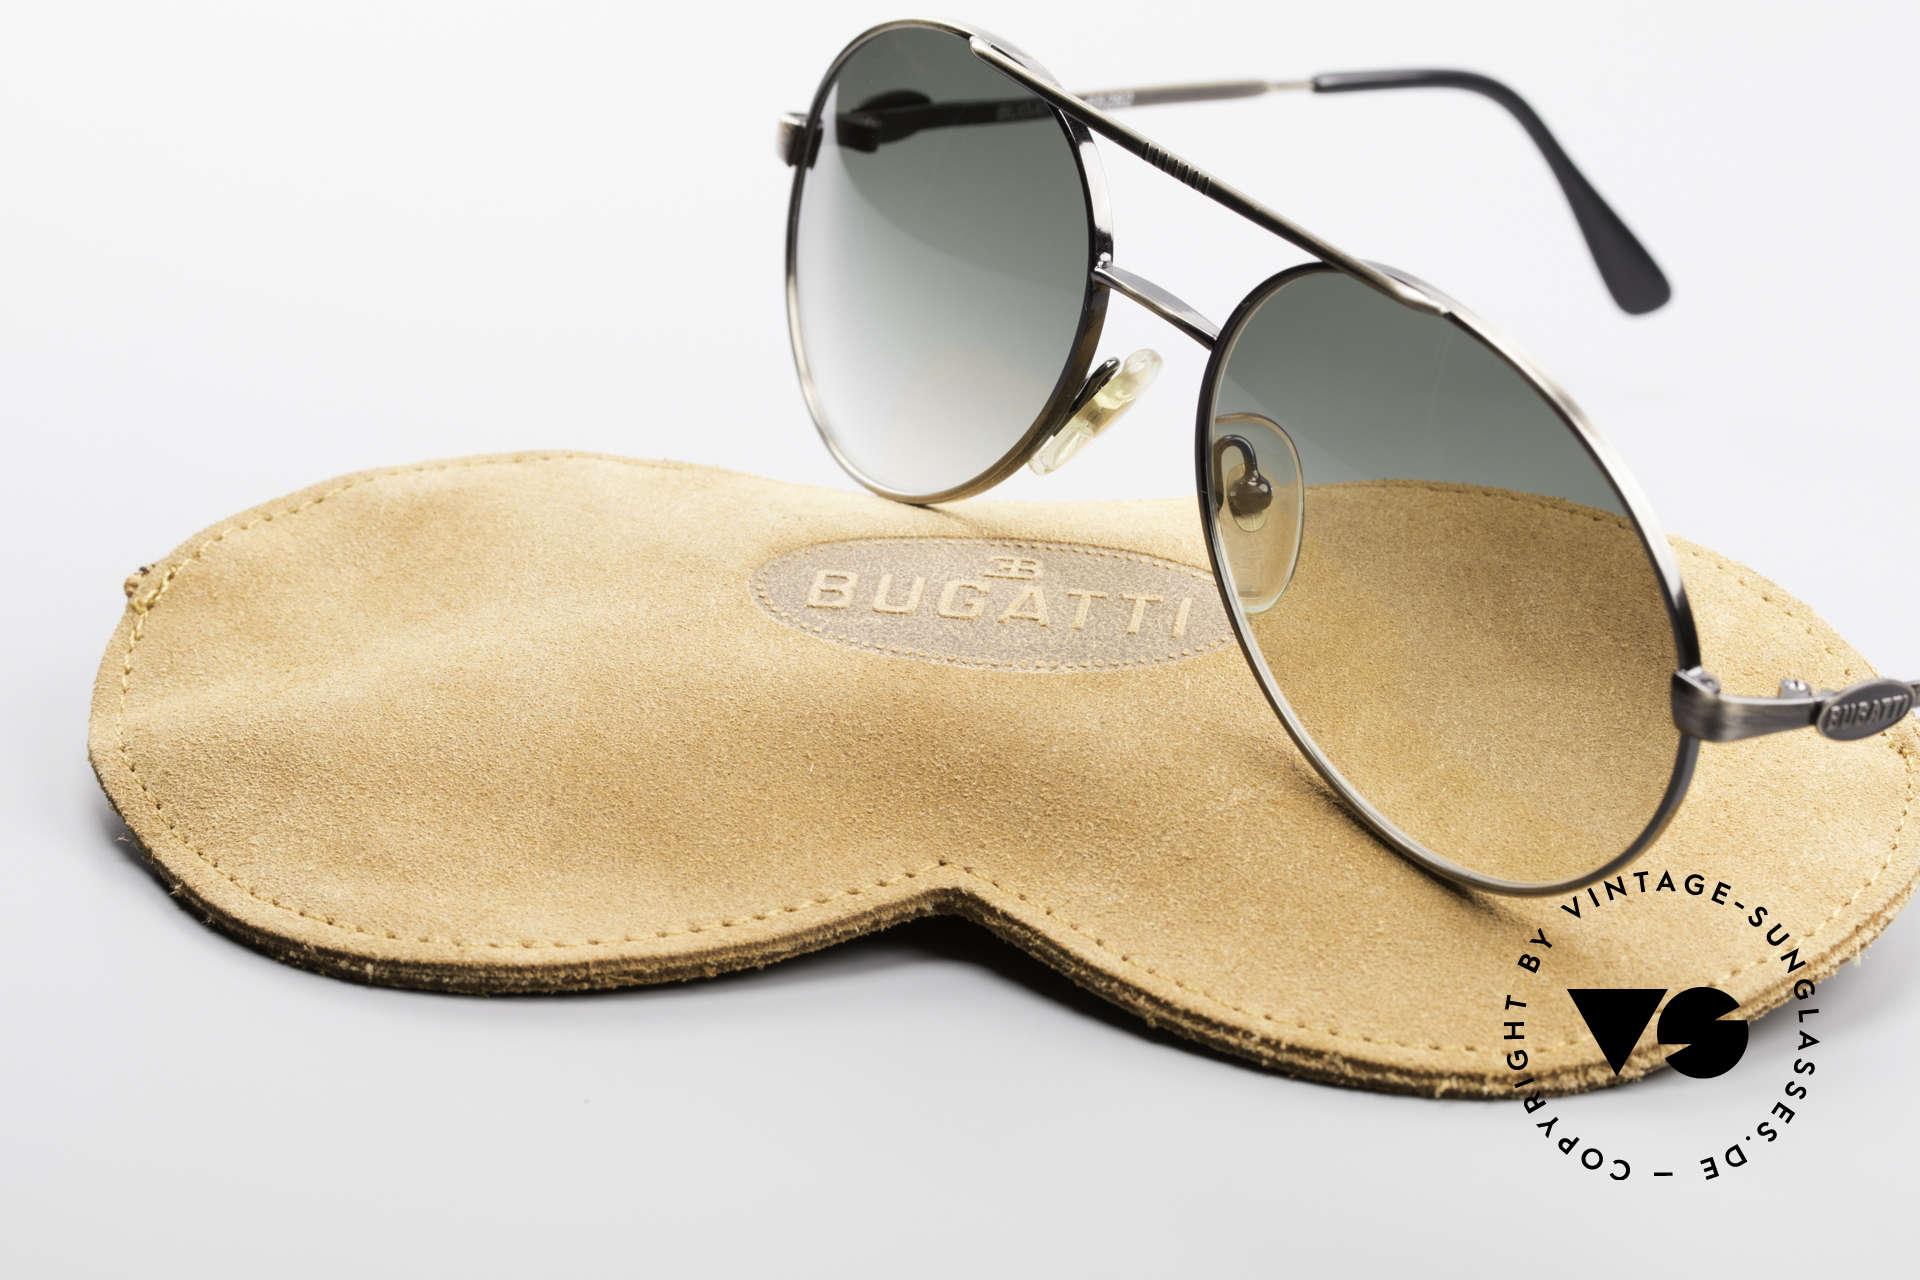 Bugatti 65282 Original 80's Shades No Retro, NO retro fashion, but a genuine Bugatti original; vertu, Made for Men